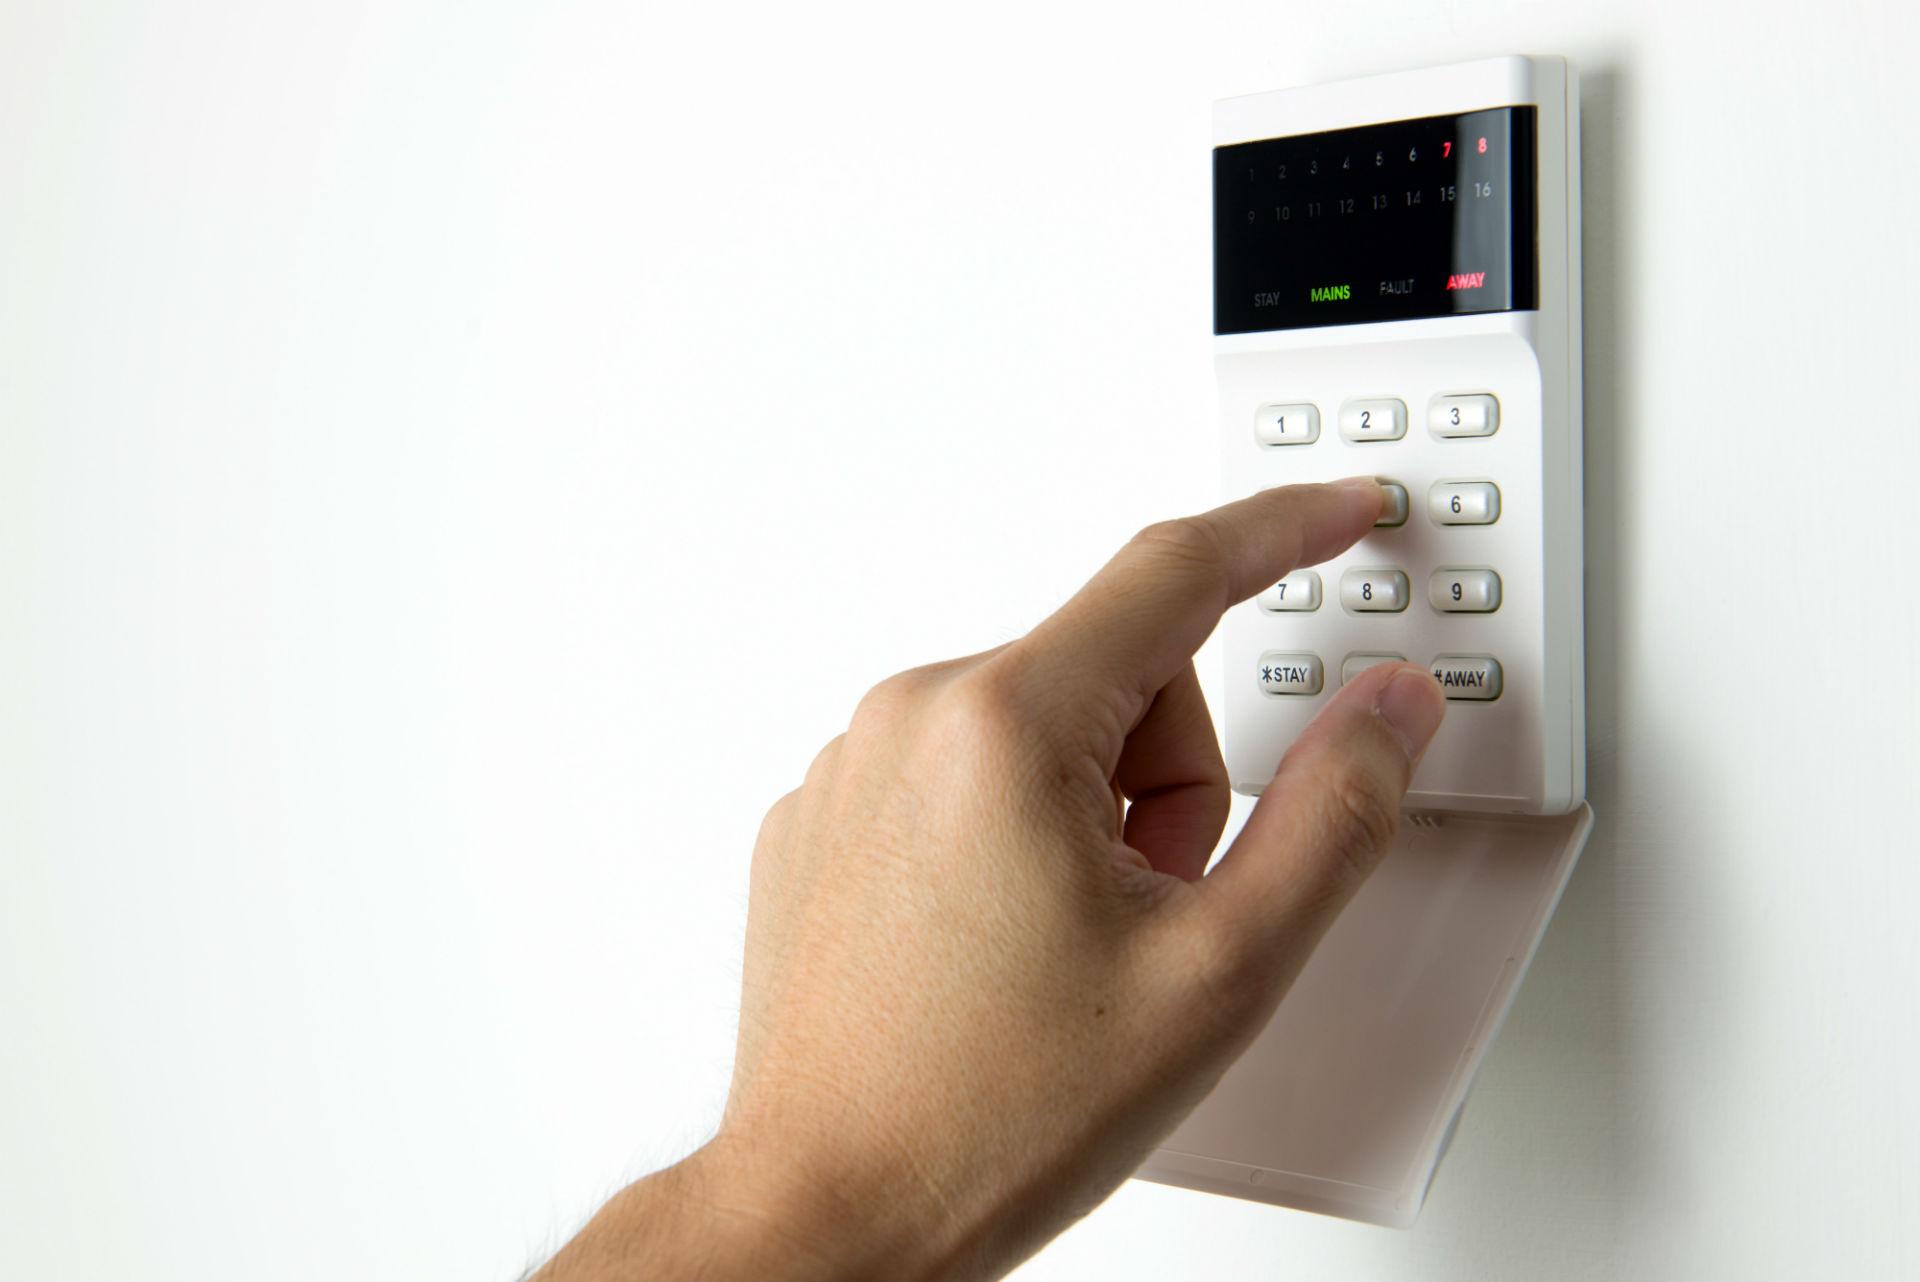 home-alarm-system-P97V6XW-min